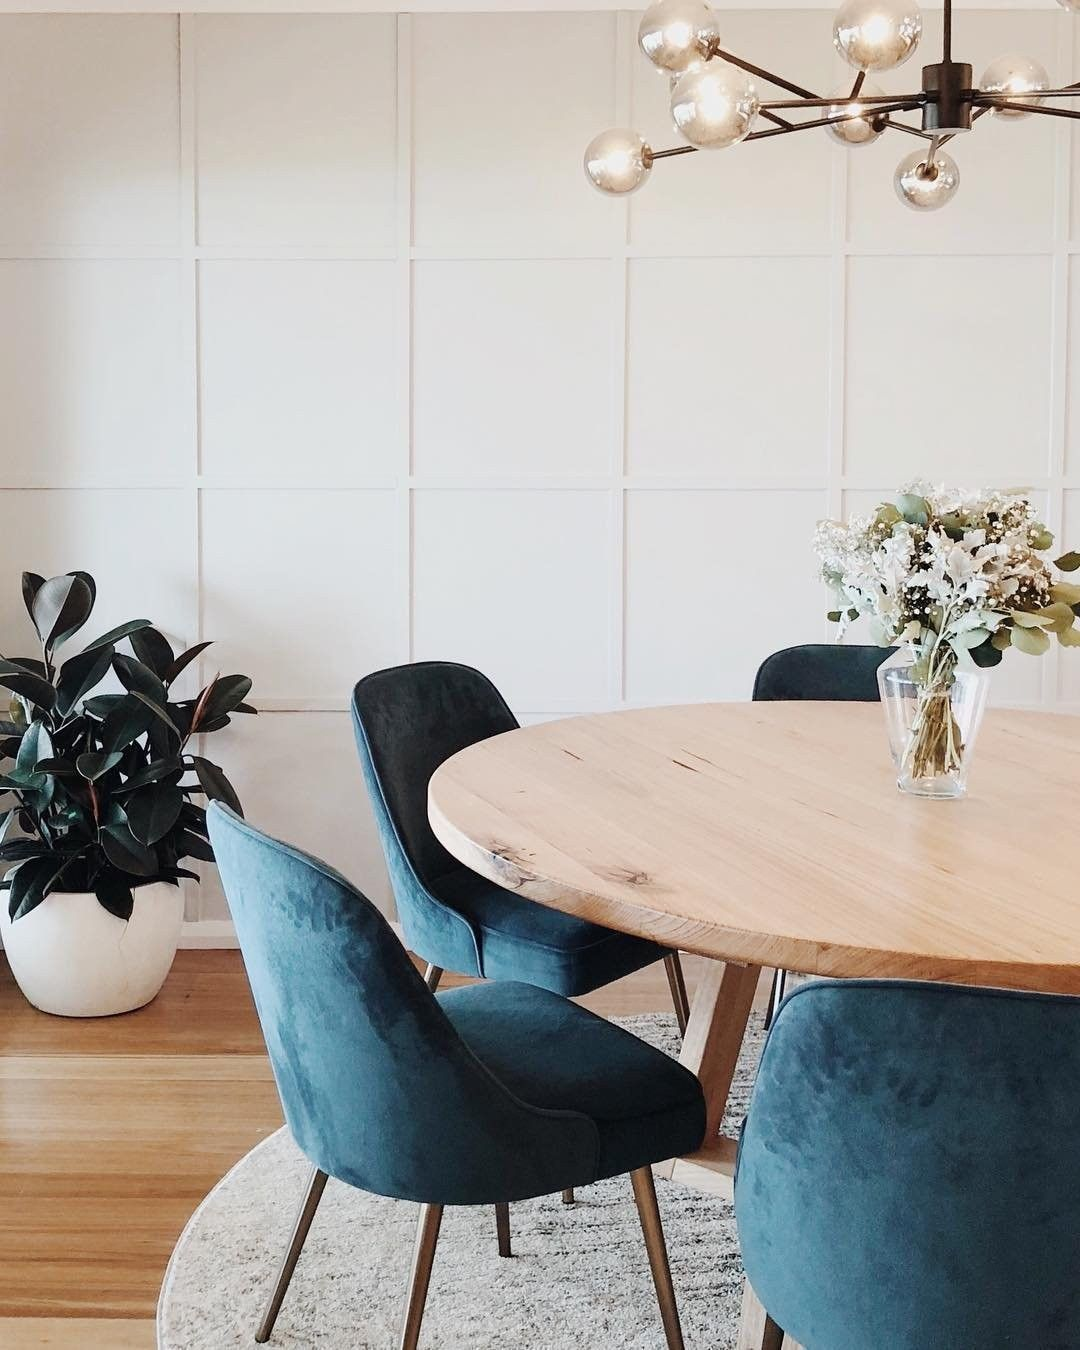 Pin On Deco Inspiration Interiors